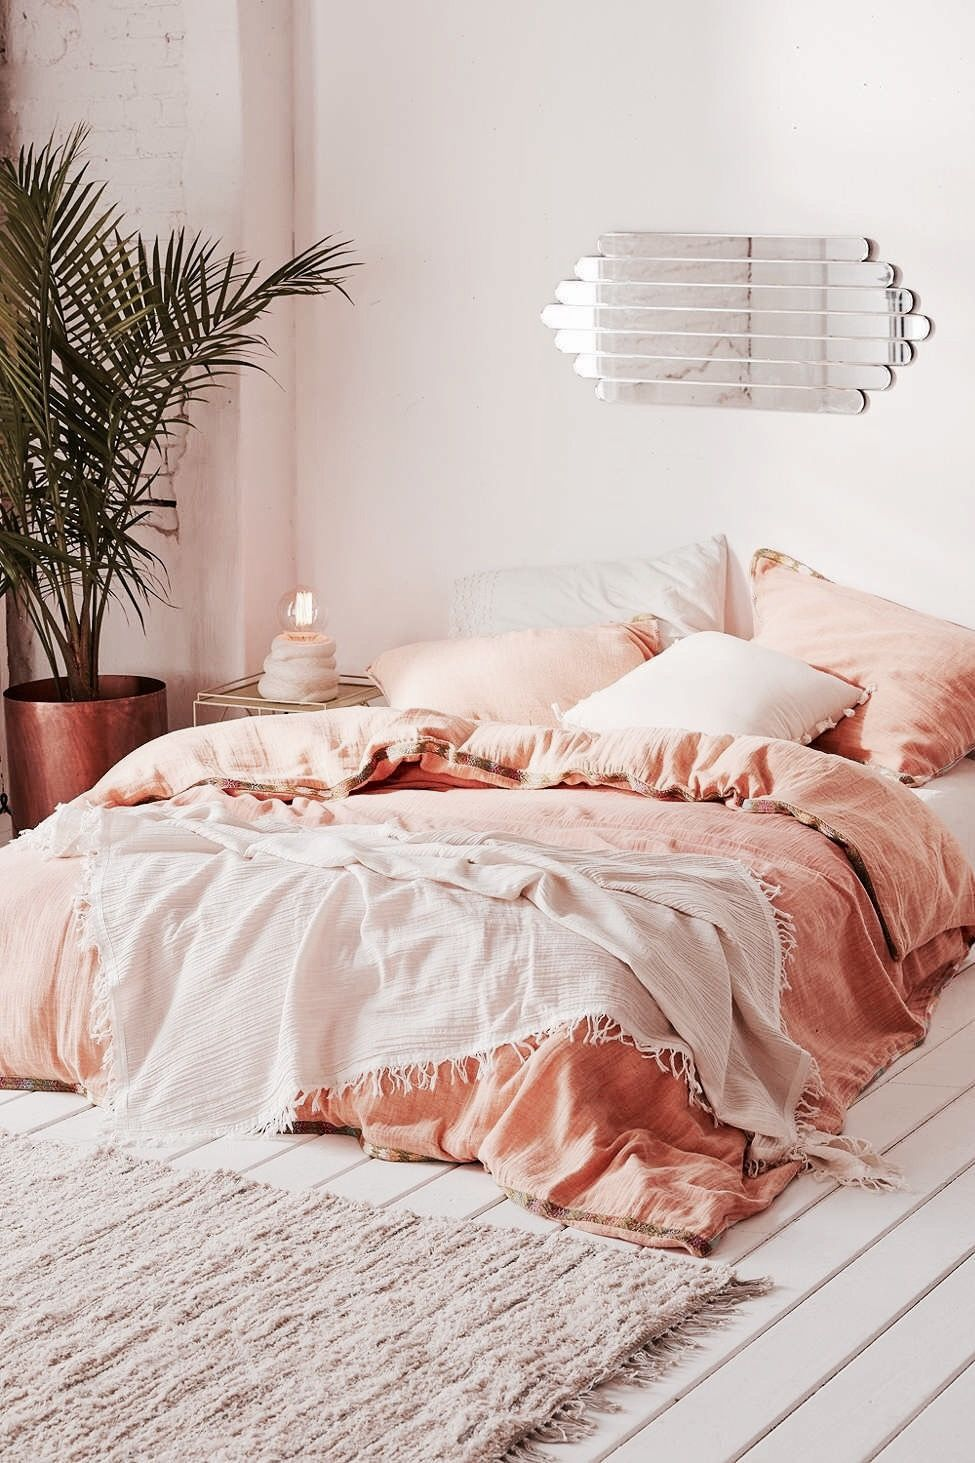 Pinterest Connellmikayla Bedroom Interior Peach Bedroom